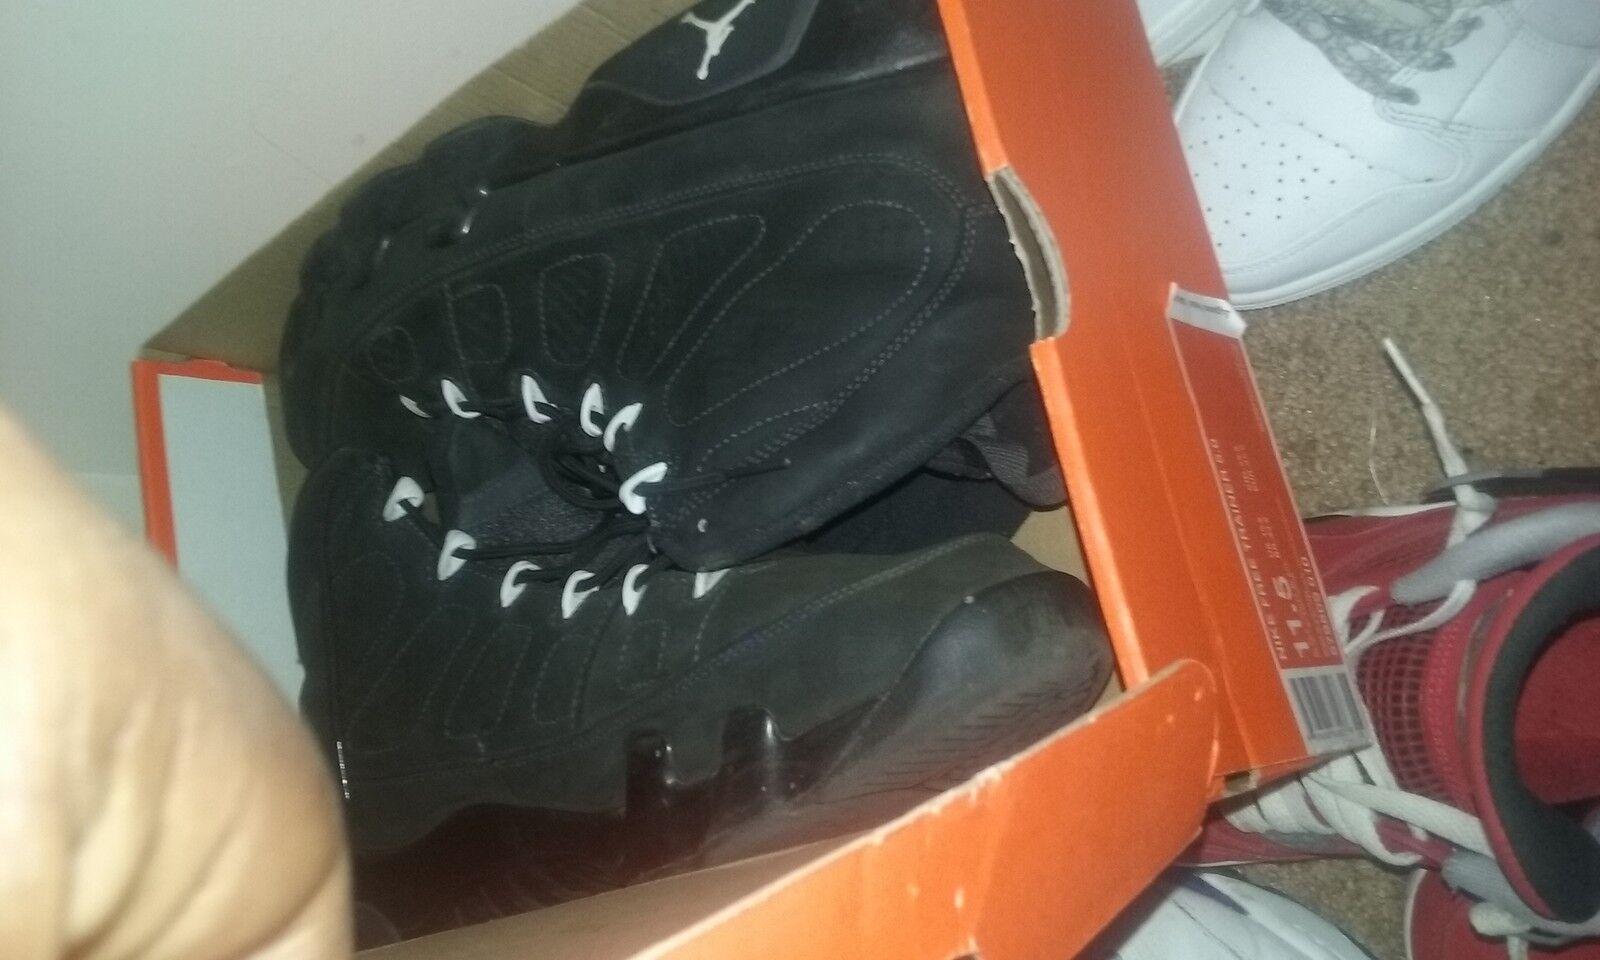 Air Jordan 9 Size 13 Men's Anthracite Gray Suede IV Grey Black White Retro